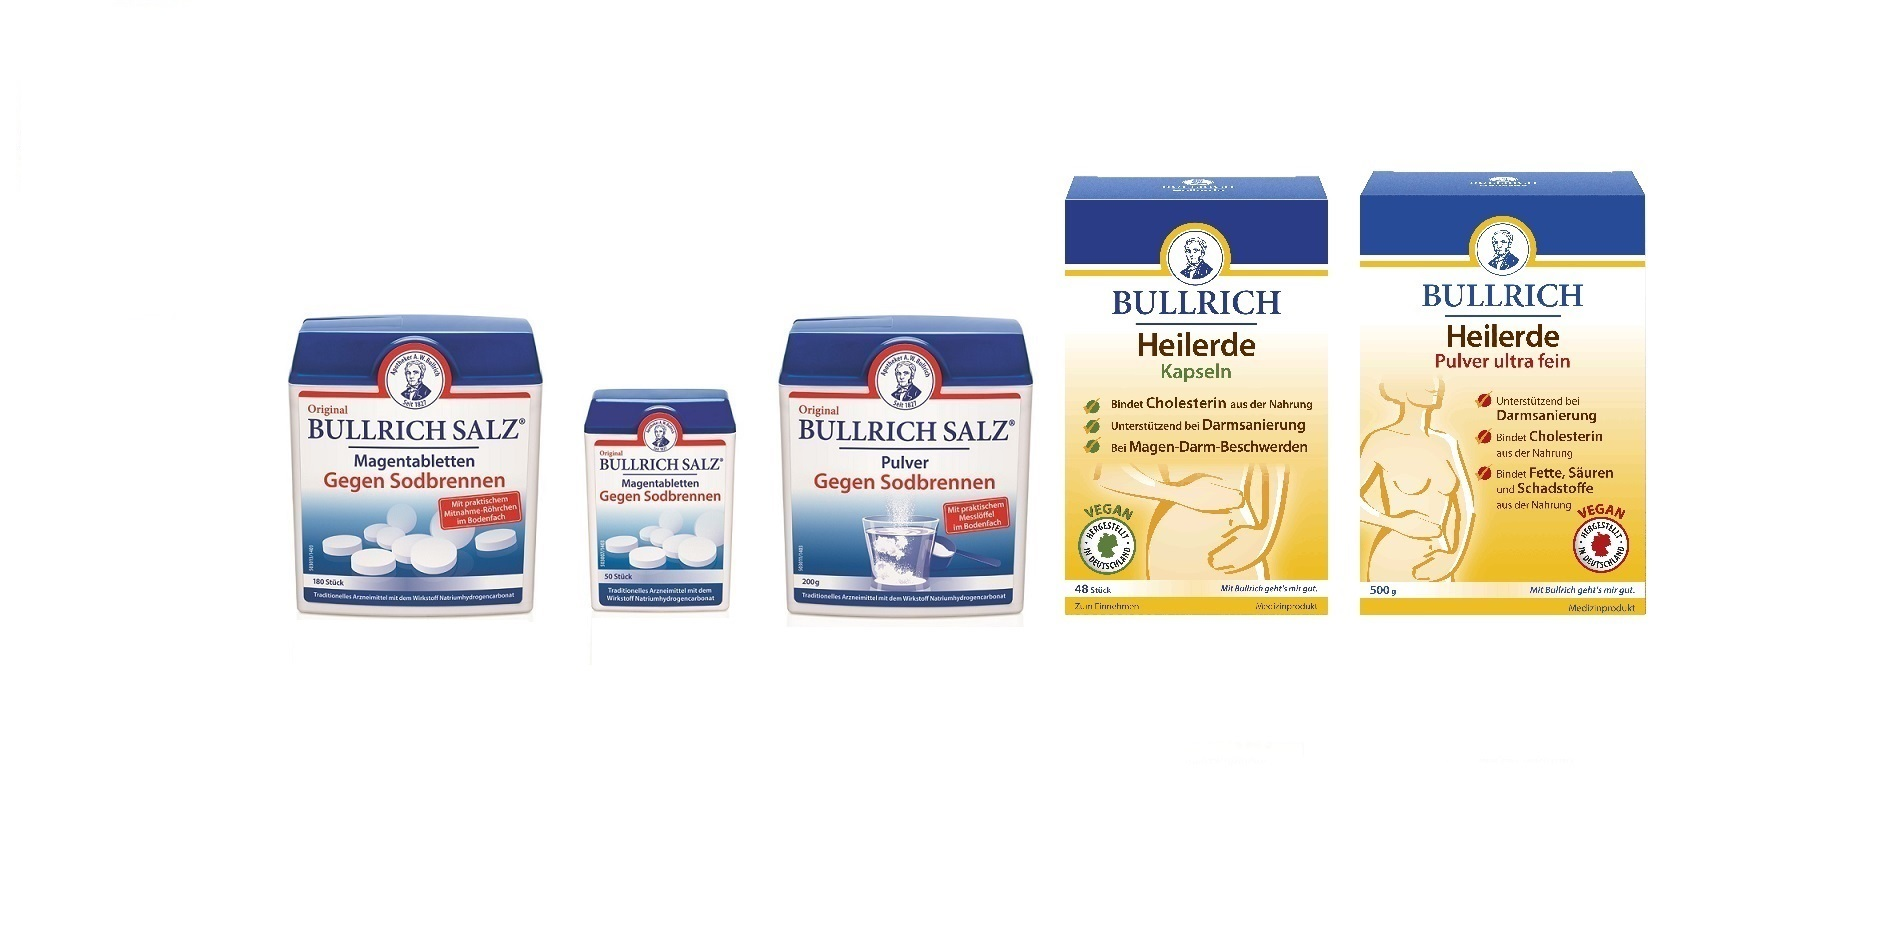 bullrich salz tabletten einnahme